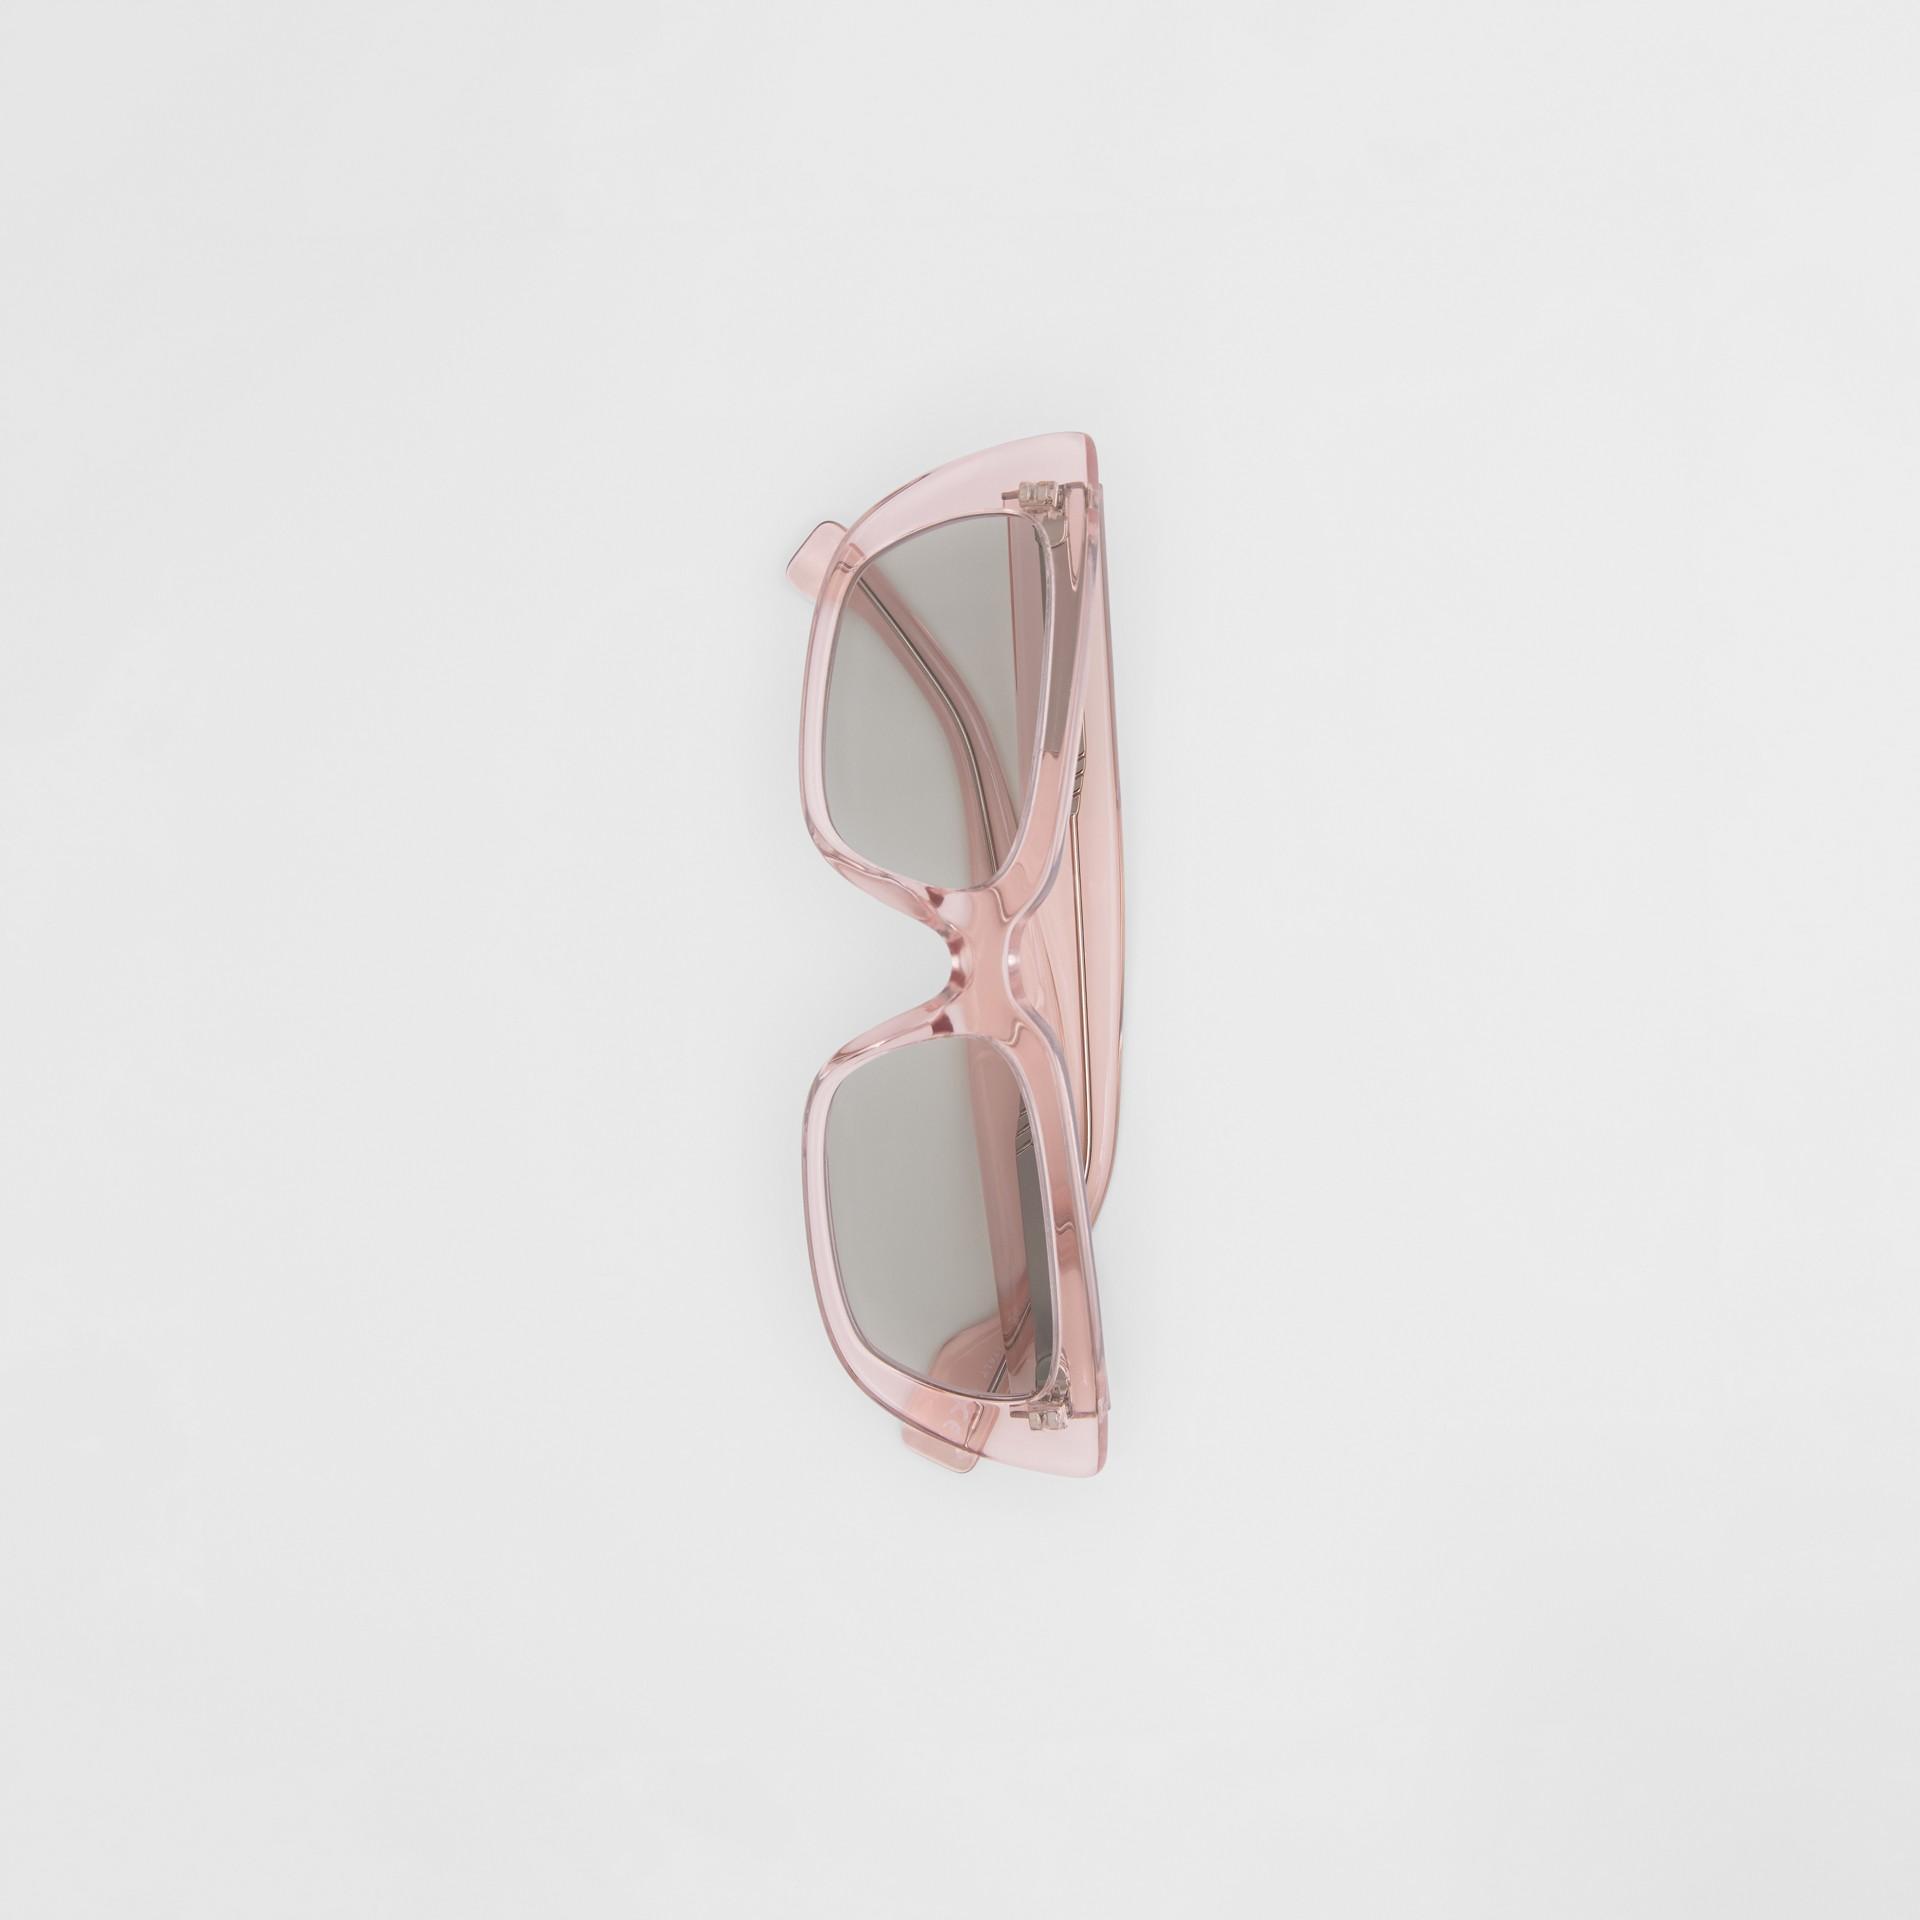 Bio-acetate Rectangular Frame Sunglasses in Light Pink - Women | Burberry - gallery image 3